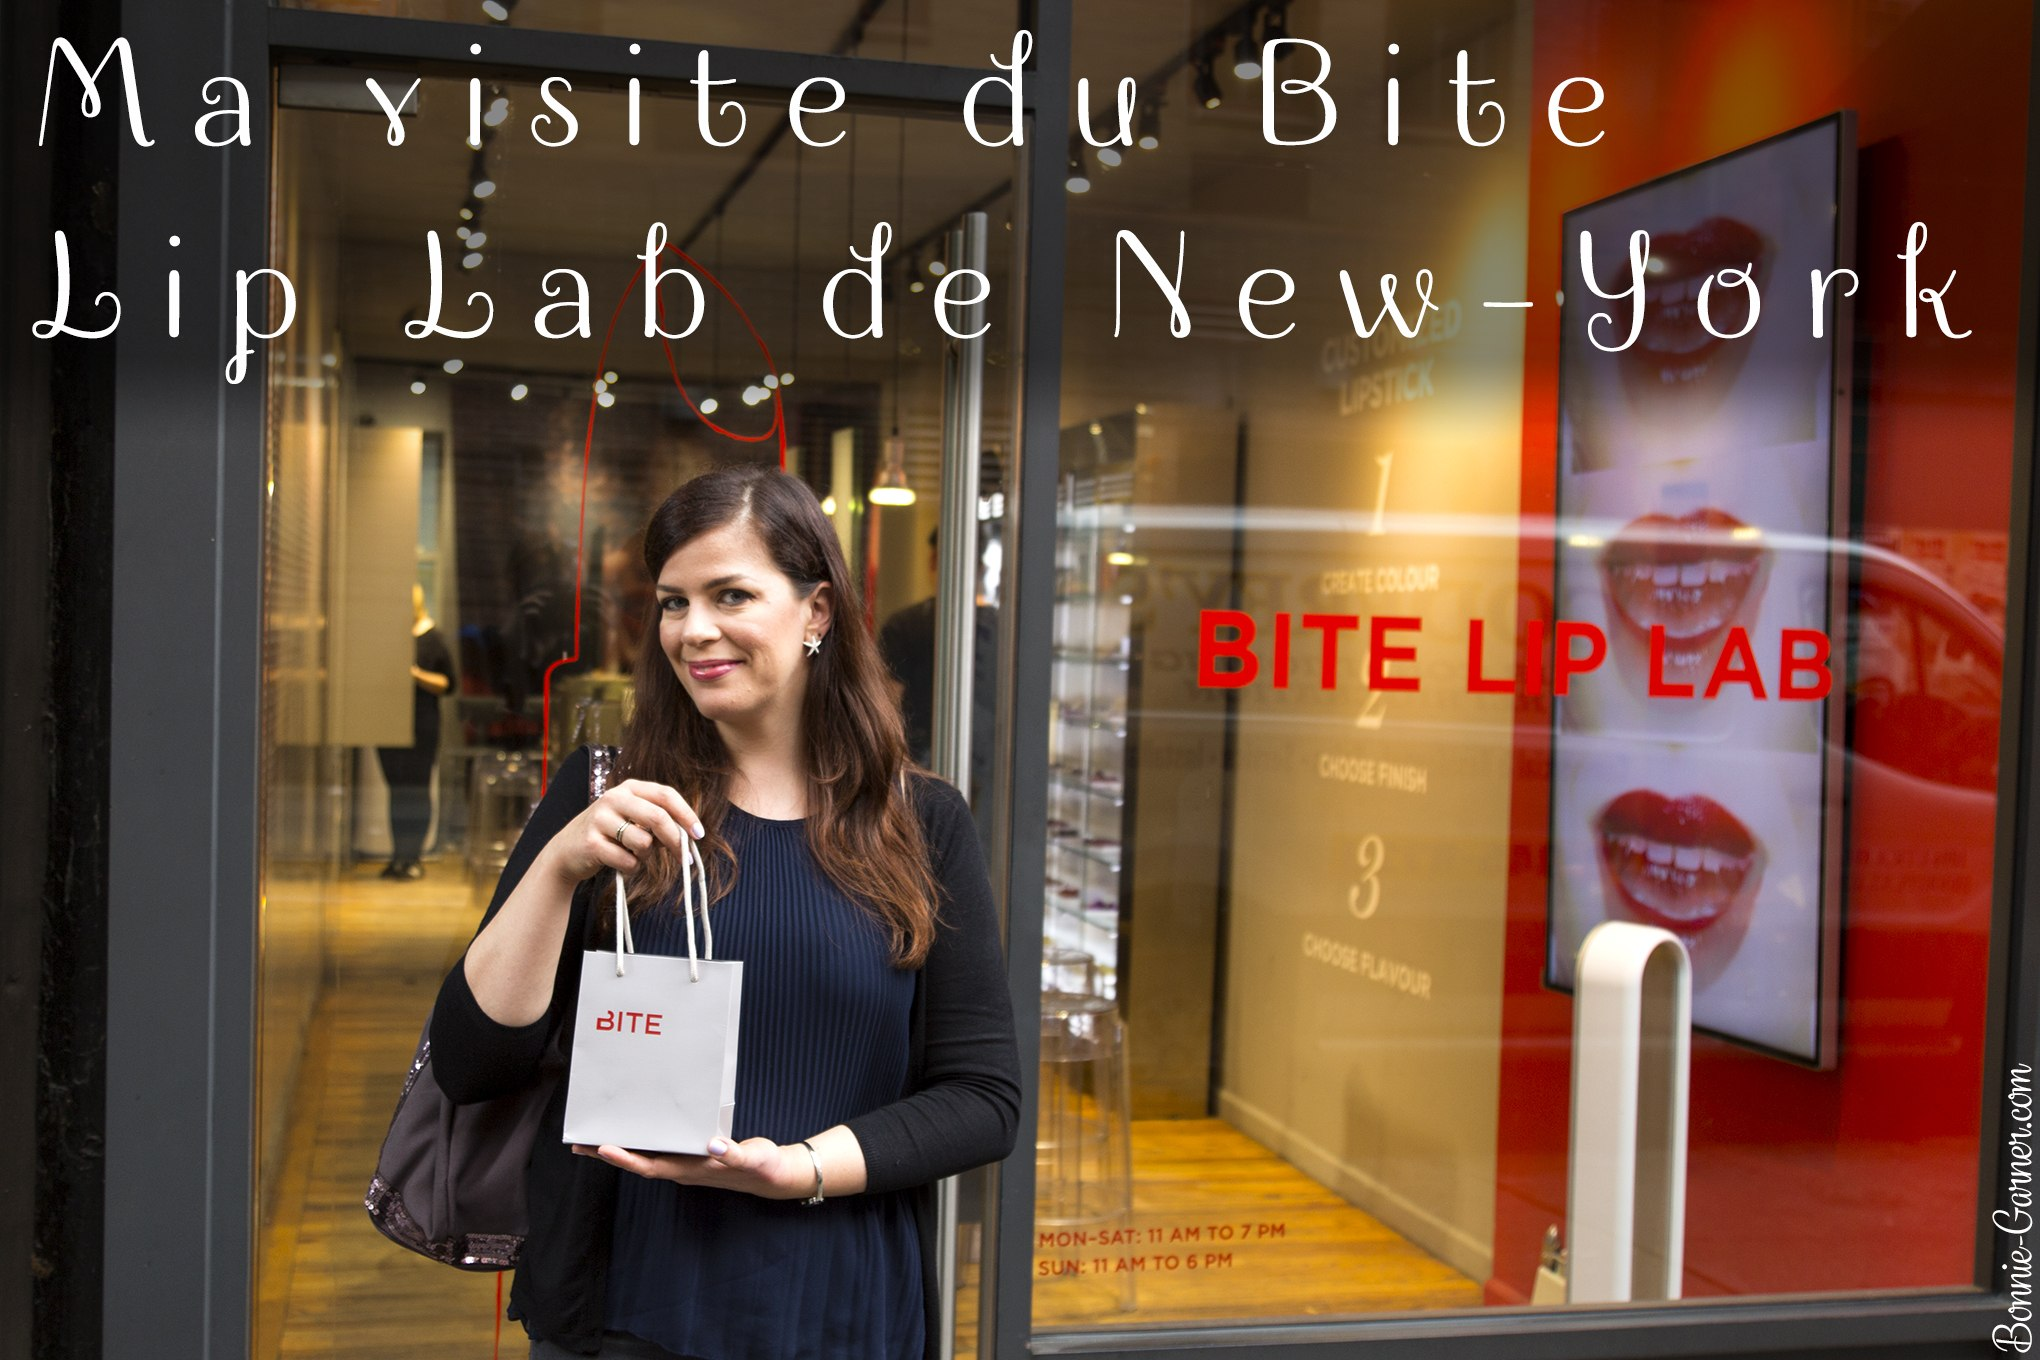 Ma visite du Bite Lip Lab de New-York